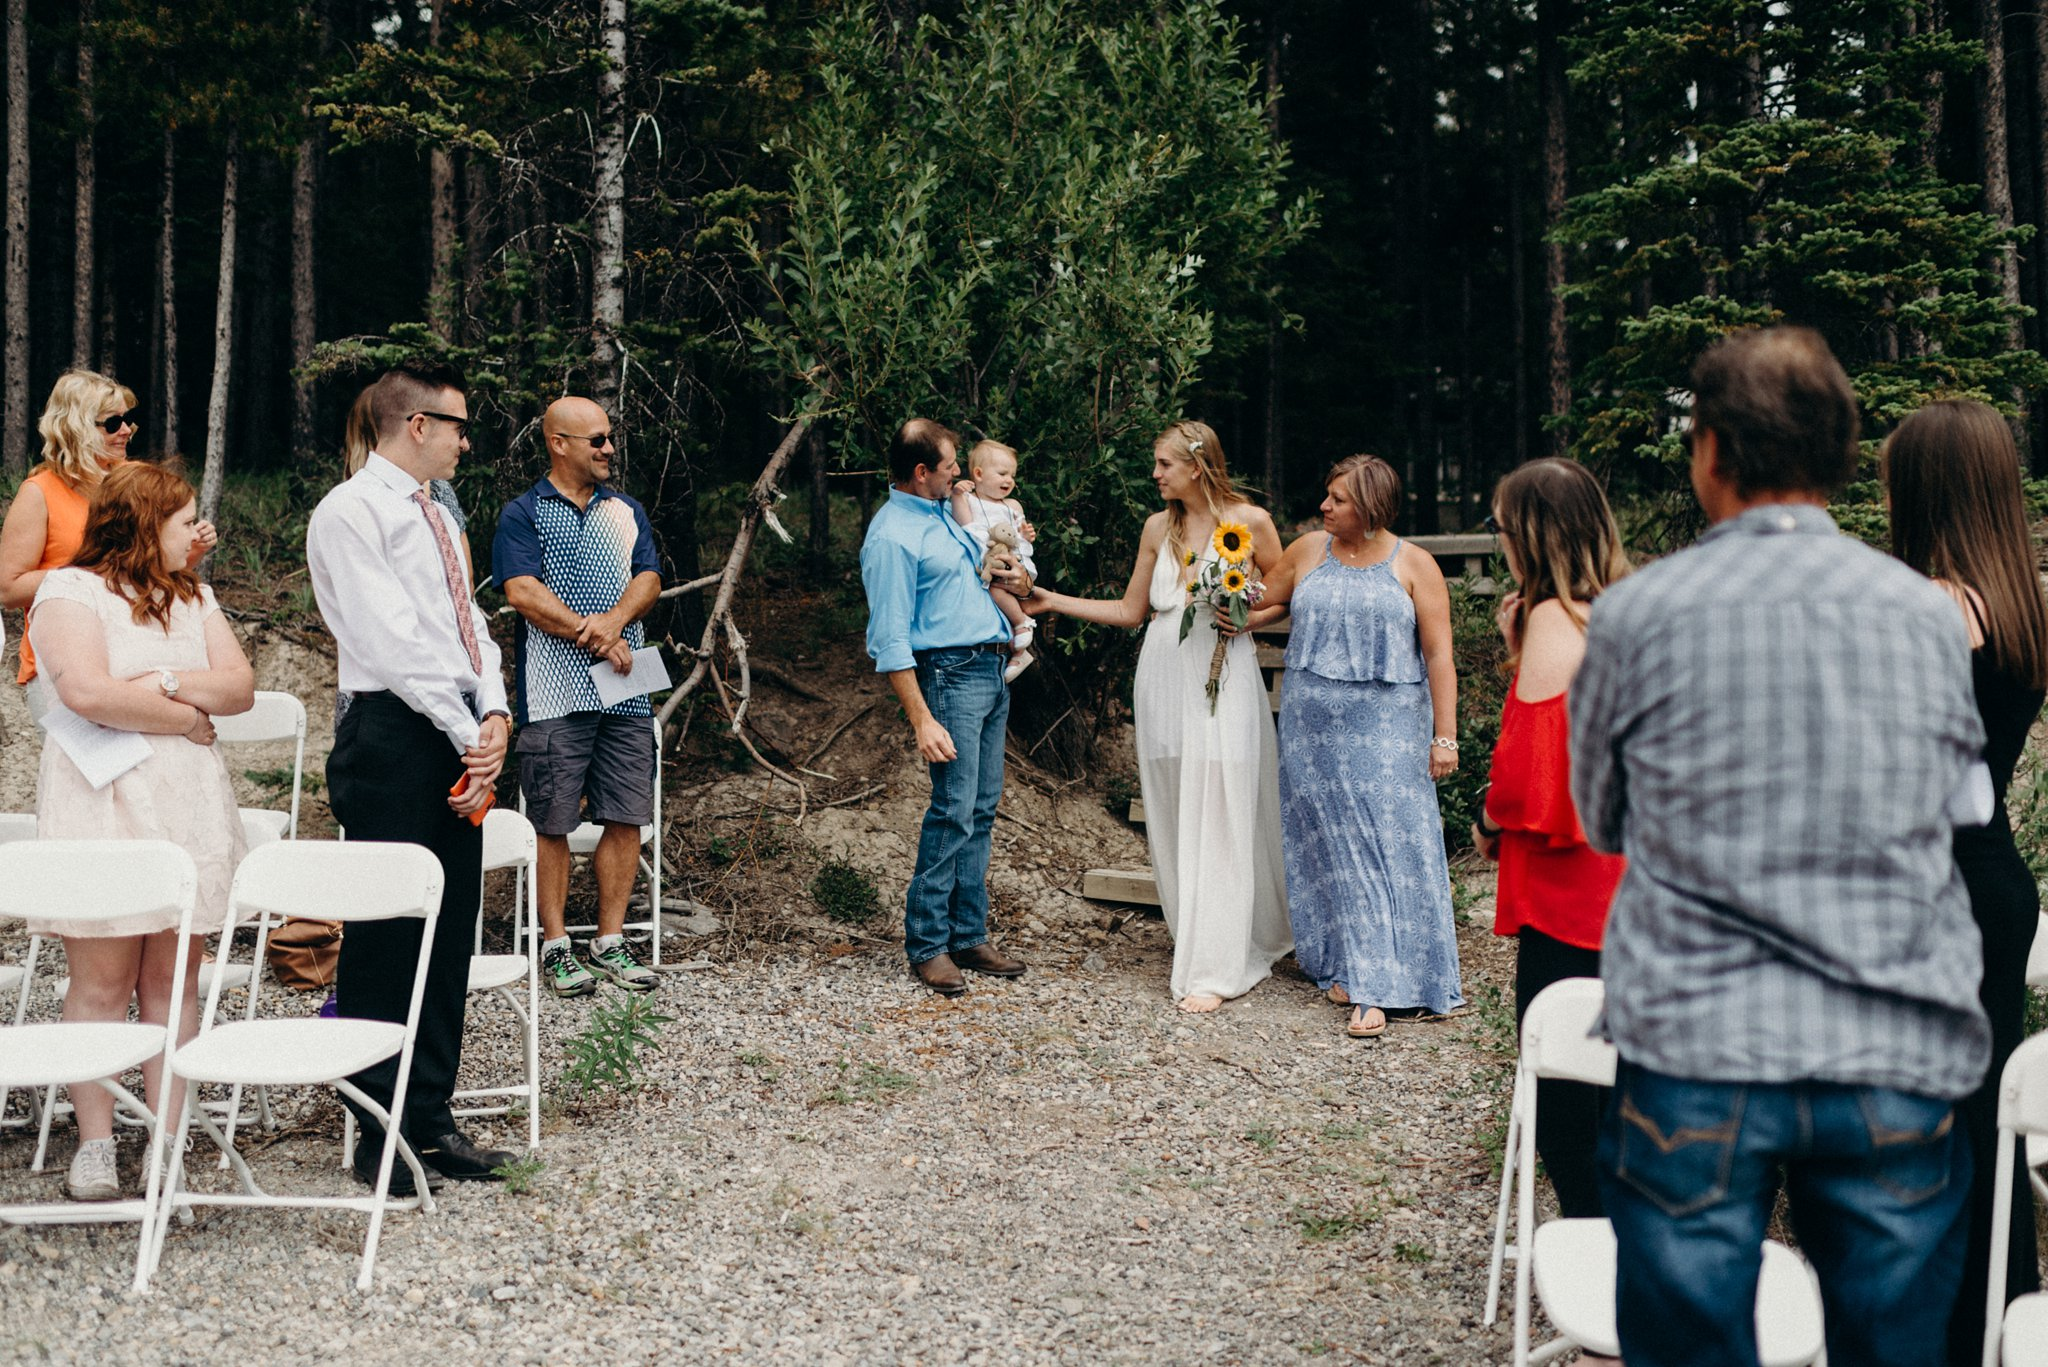 kaihla_tonai_intimate_wedding_elopement_photographer_6371.jpg